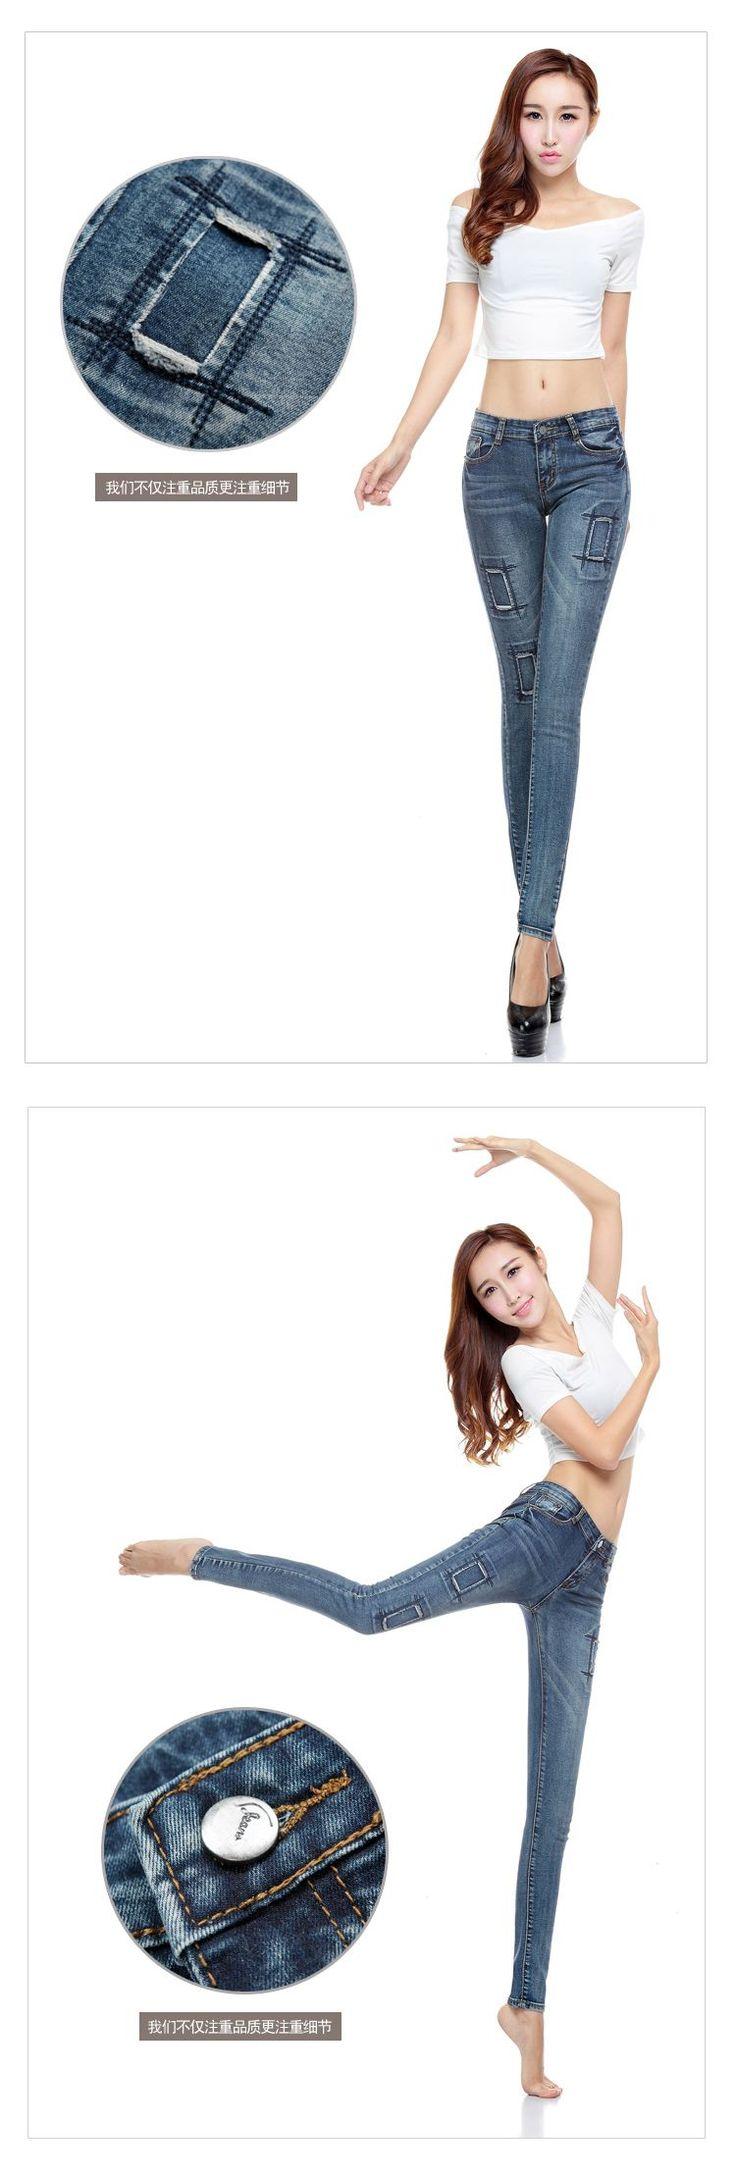 Aliexpress.com: Comprar Pencil jeans mujer Patch skinny jeans boyfriend jeans para mujeres denim pant pantalones vaqueros mujer vaqueros para mujer de pantalones vaqueros pantalones para las niñas fiable proveedores en Cheer Beauty